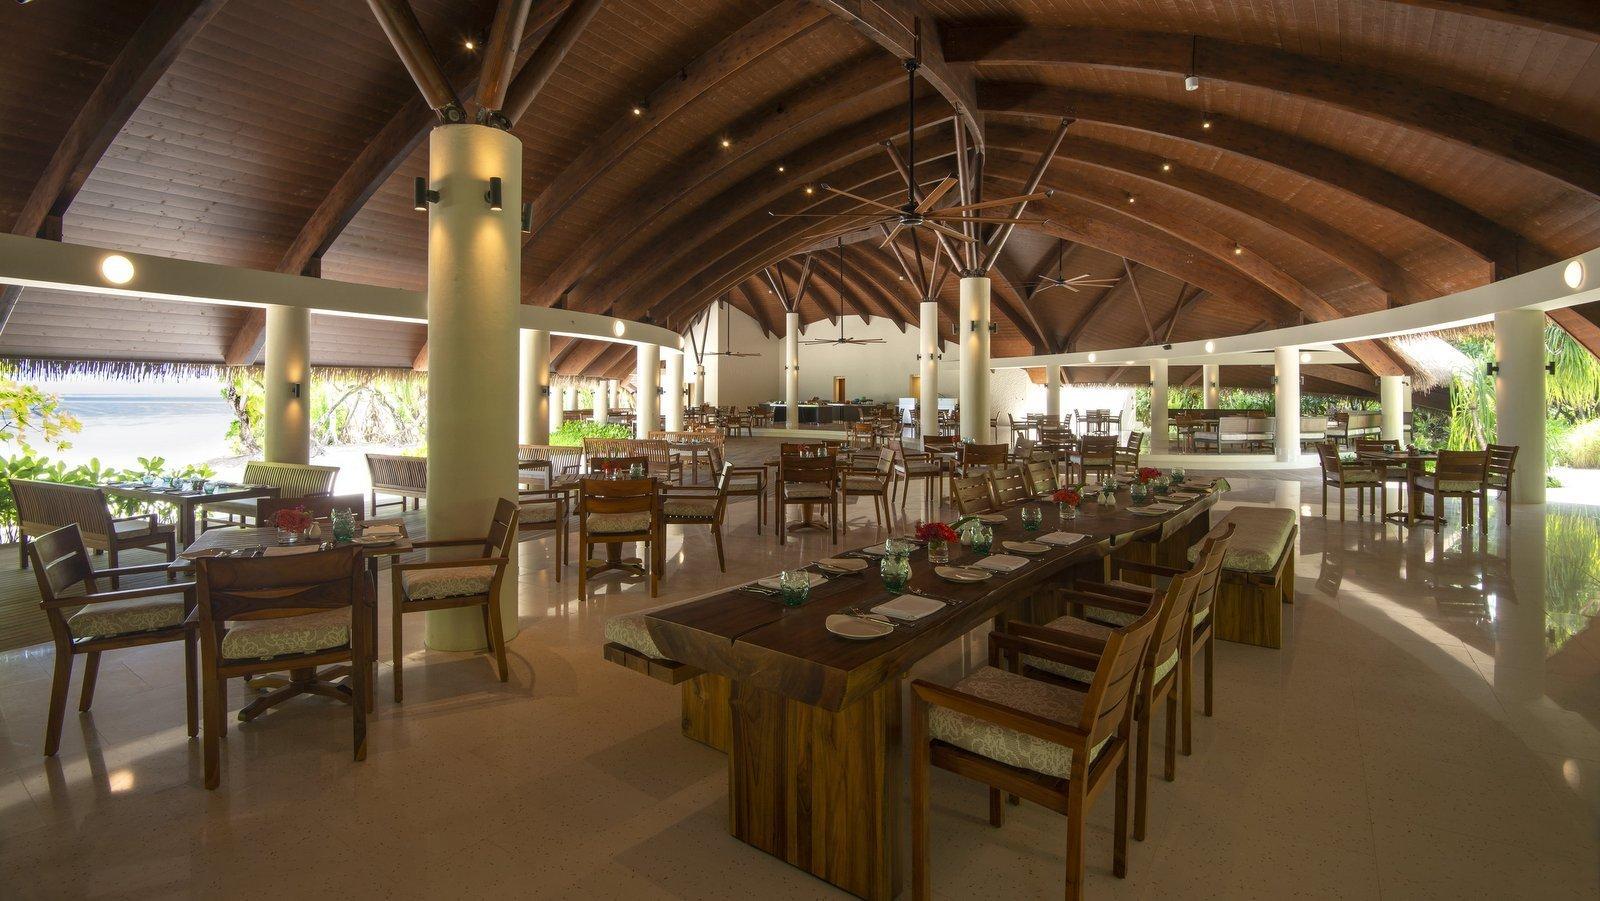 Мальдивы, отель The Residence Maldives at Dhigurah, ресторан The Dining Room